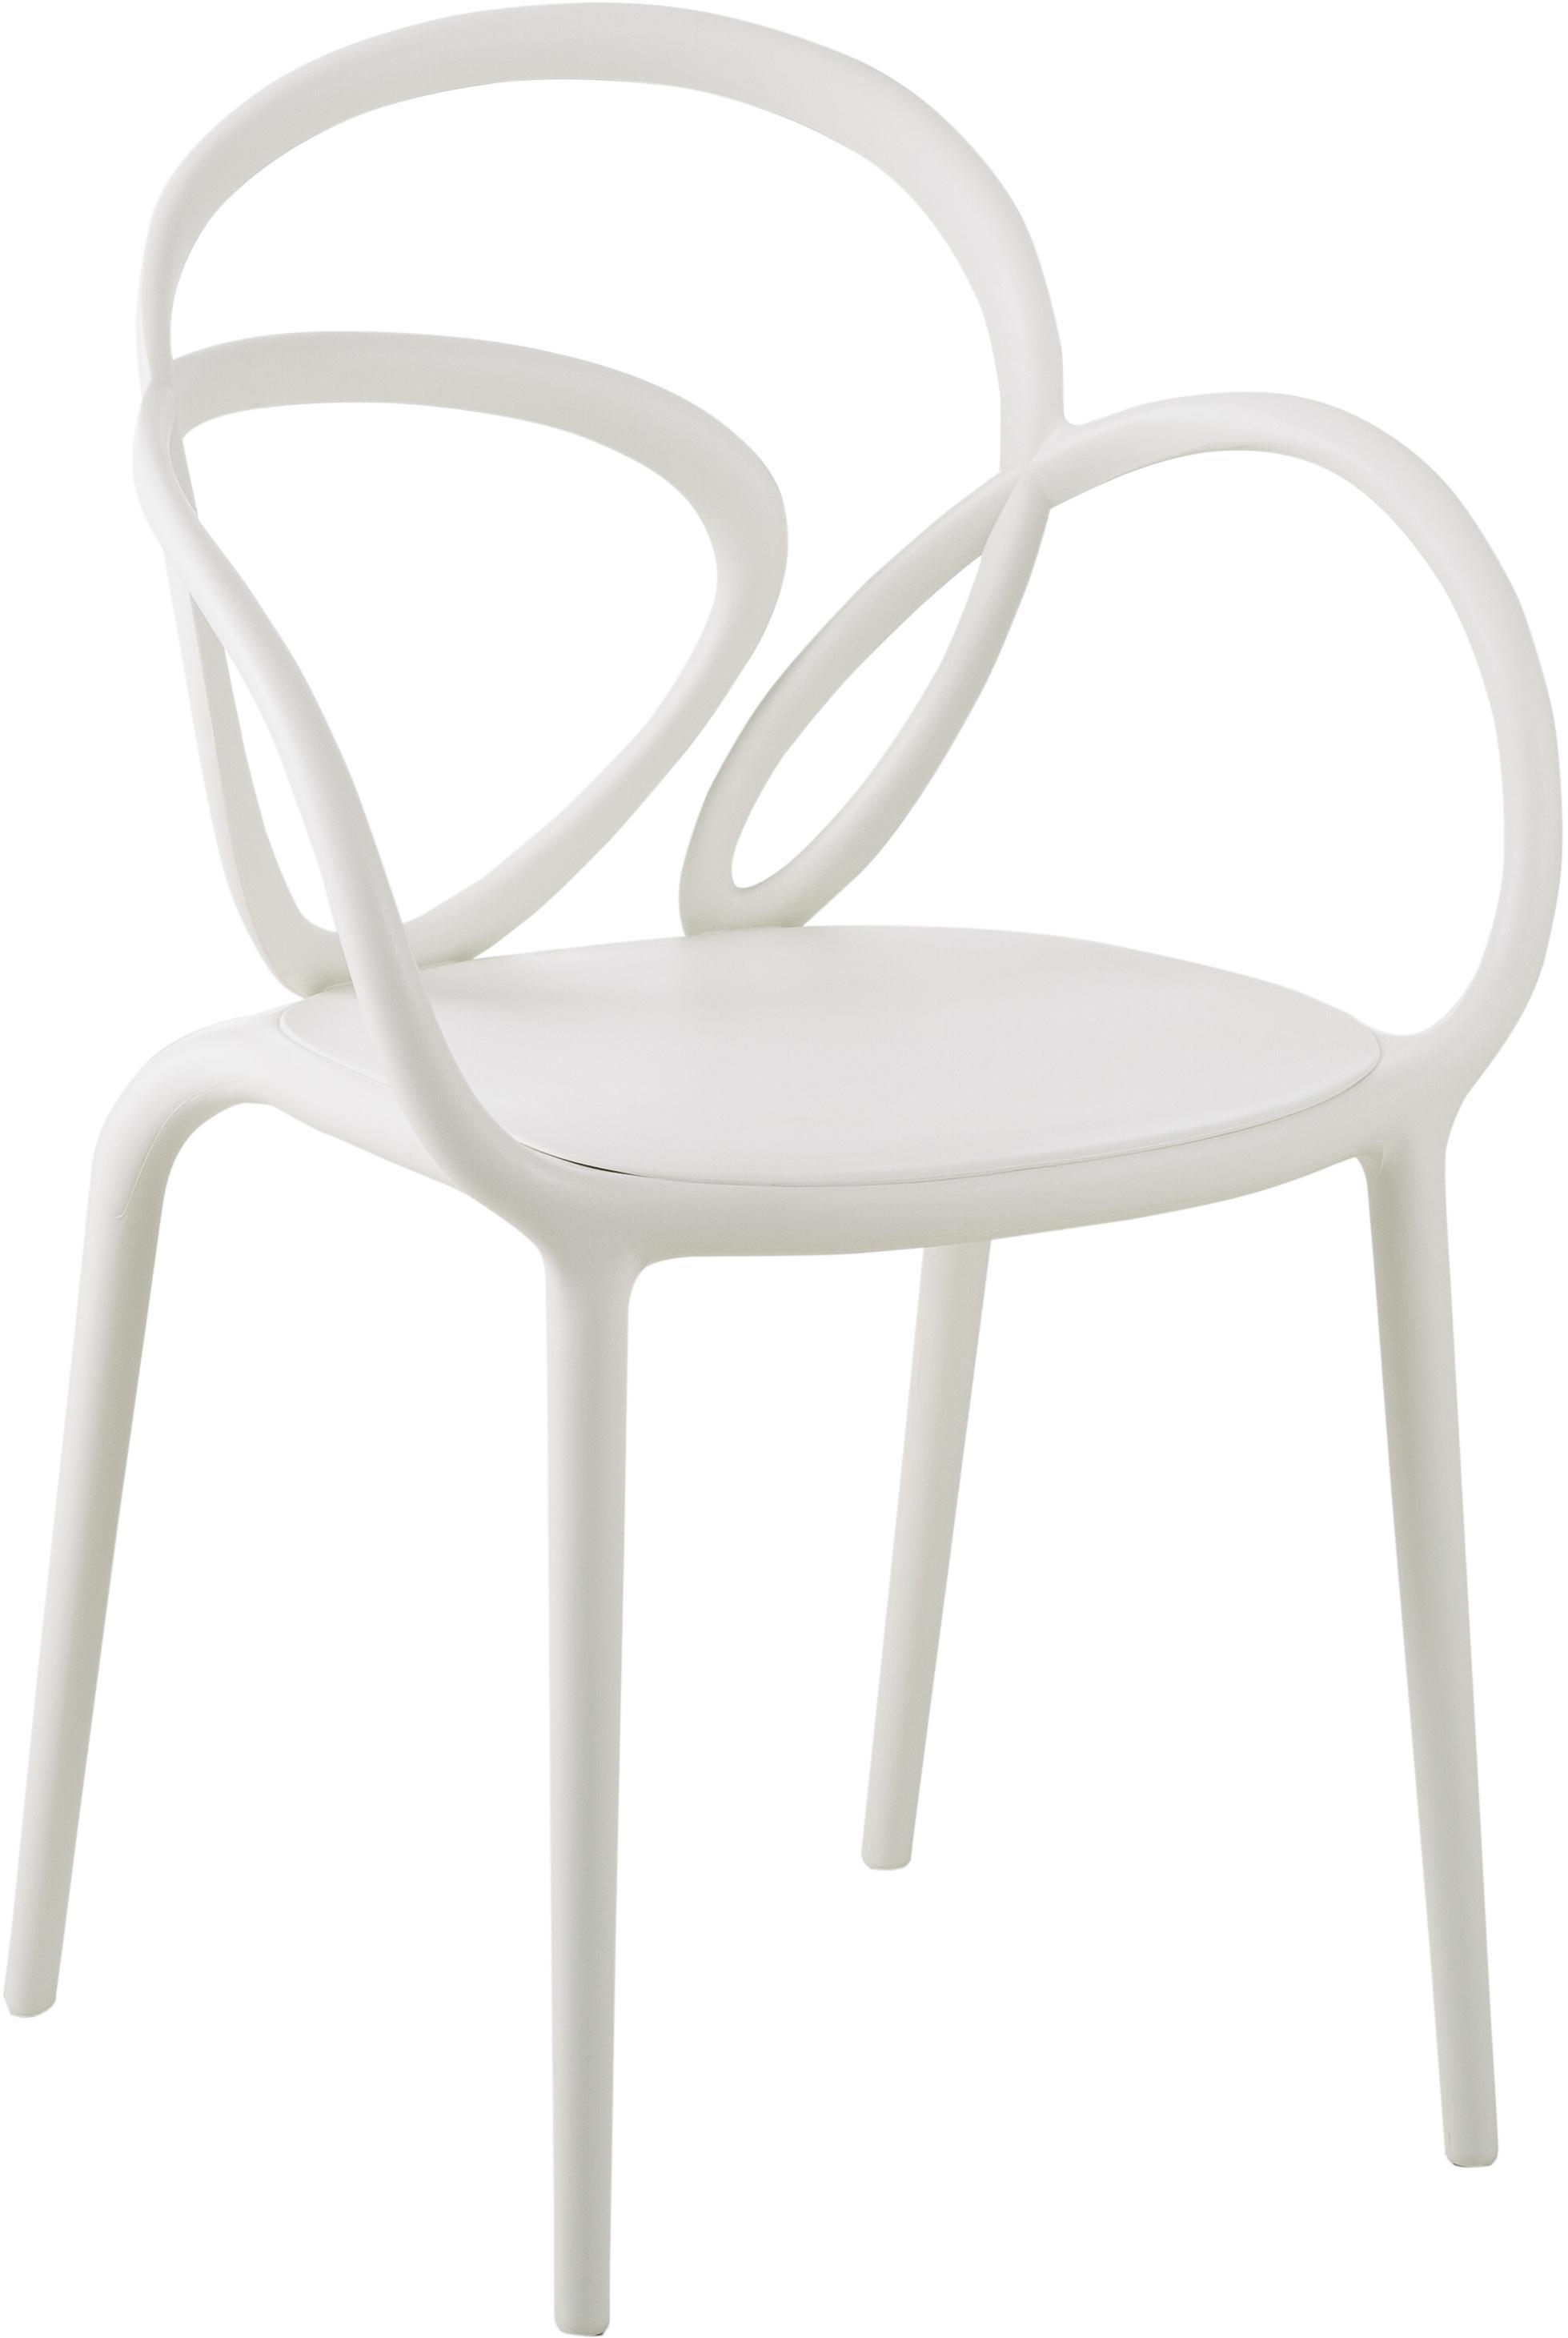 Sedia con braccioli Loop 2 pz, Polipropilene, Bianco, Larg. 52 x Prof. 56 cm